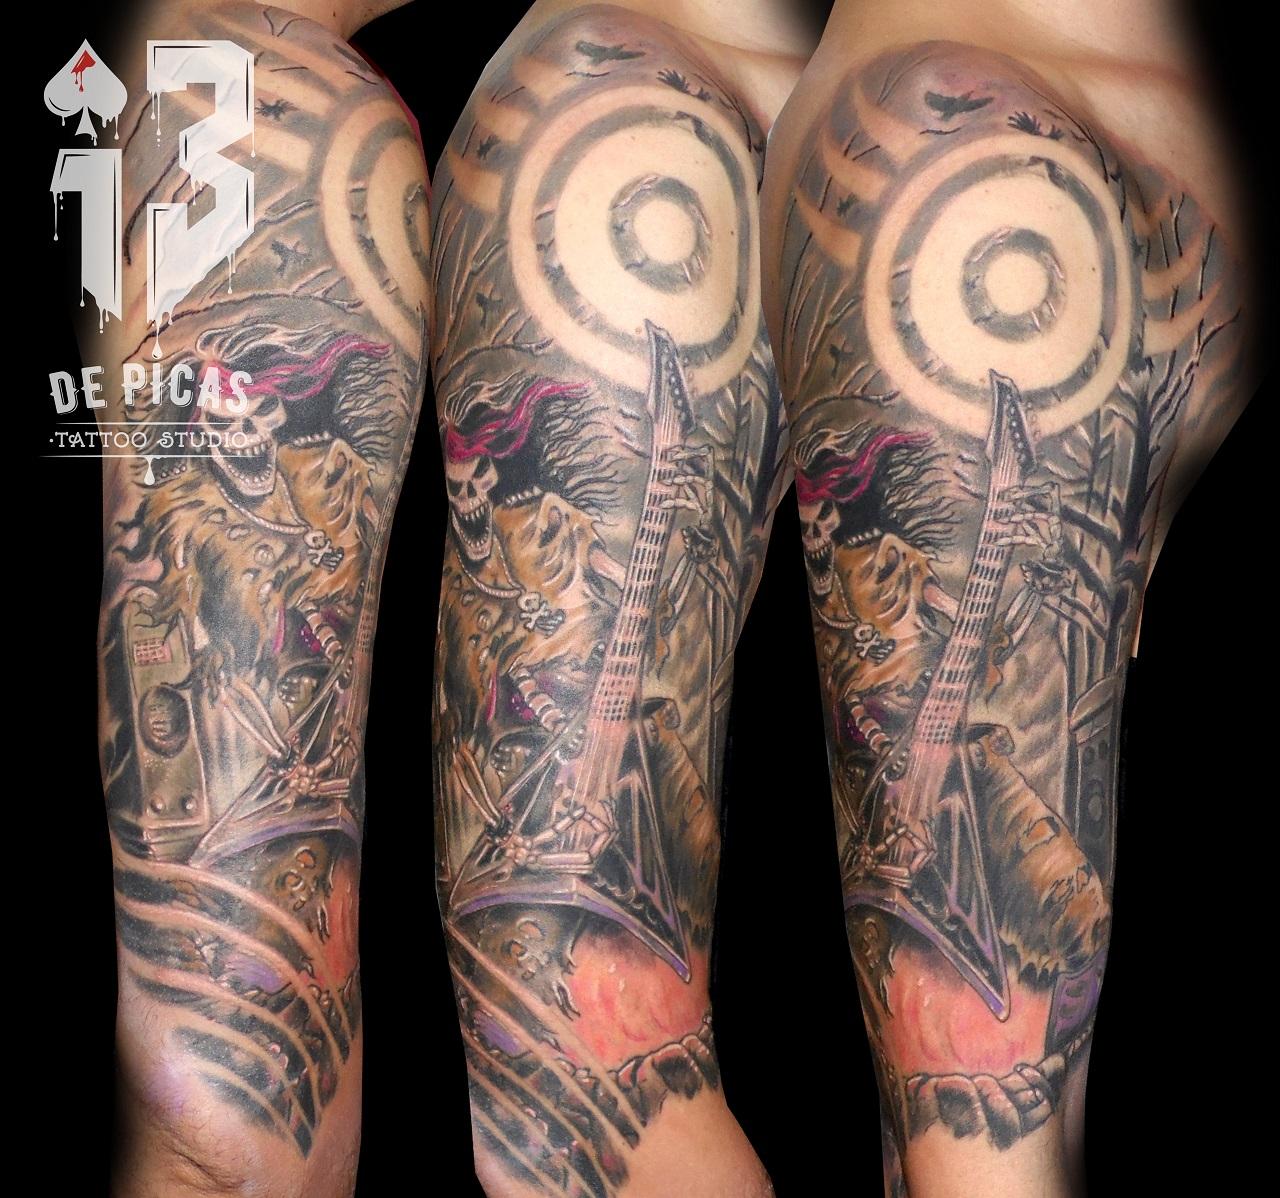 heavy metal tattoo skull tatuajes huesca jaca tattoo 13depicas trecedepicas spain españa tatuadores ilustracion